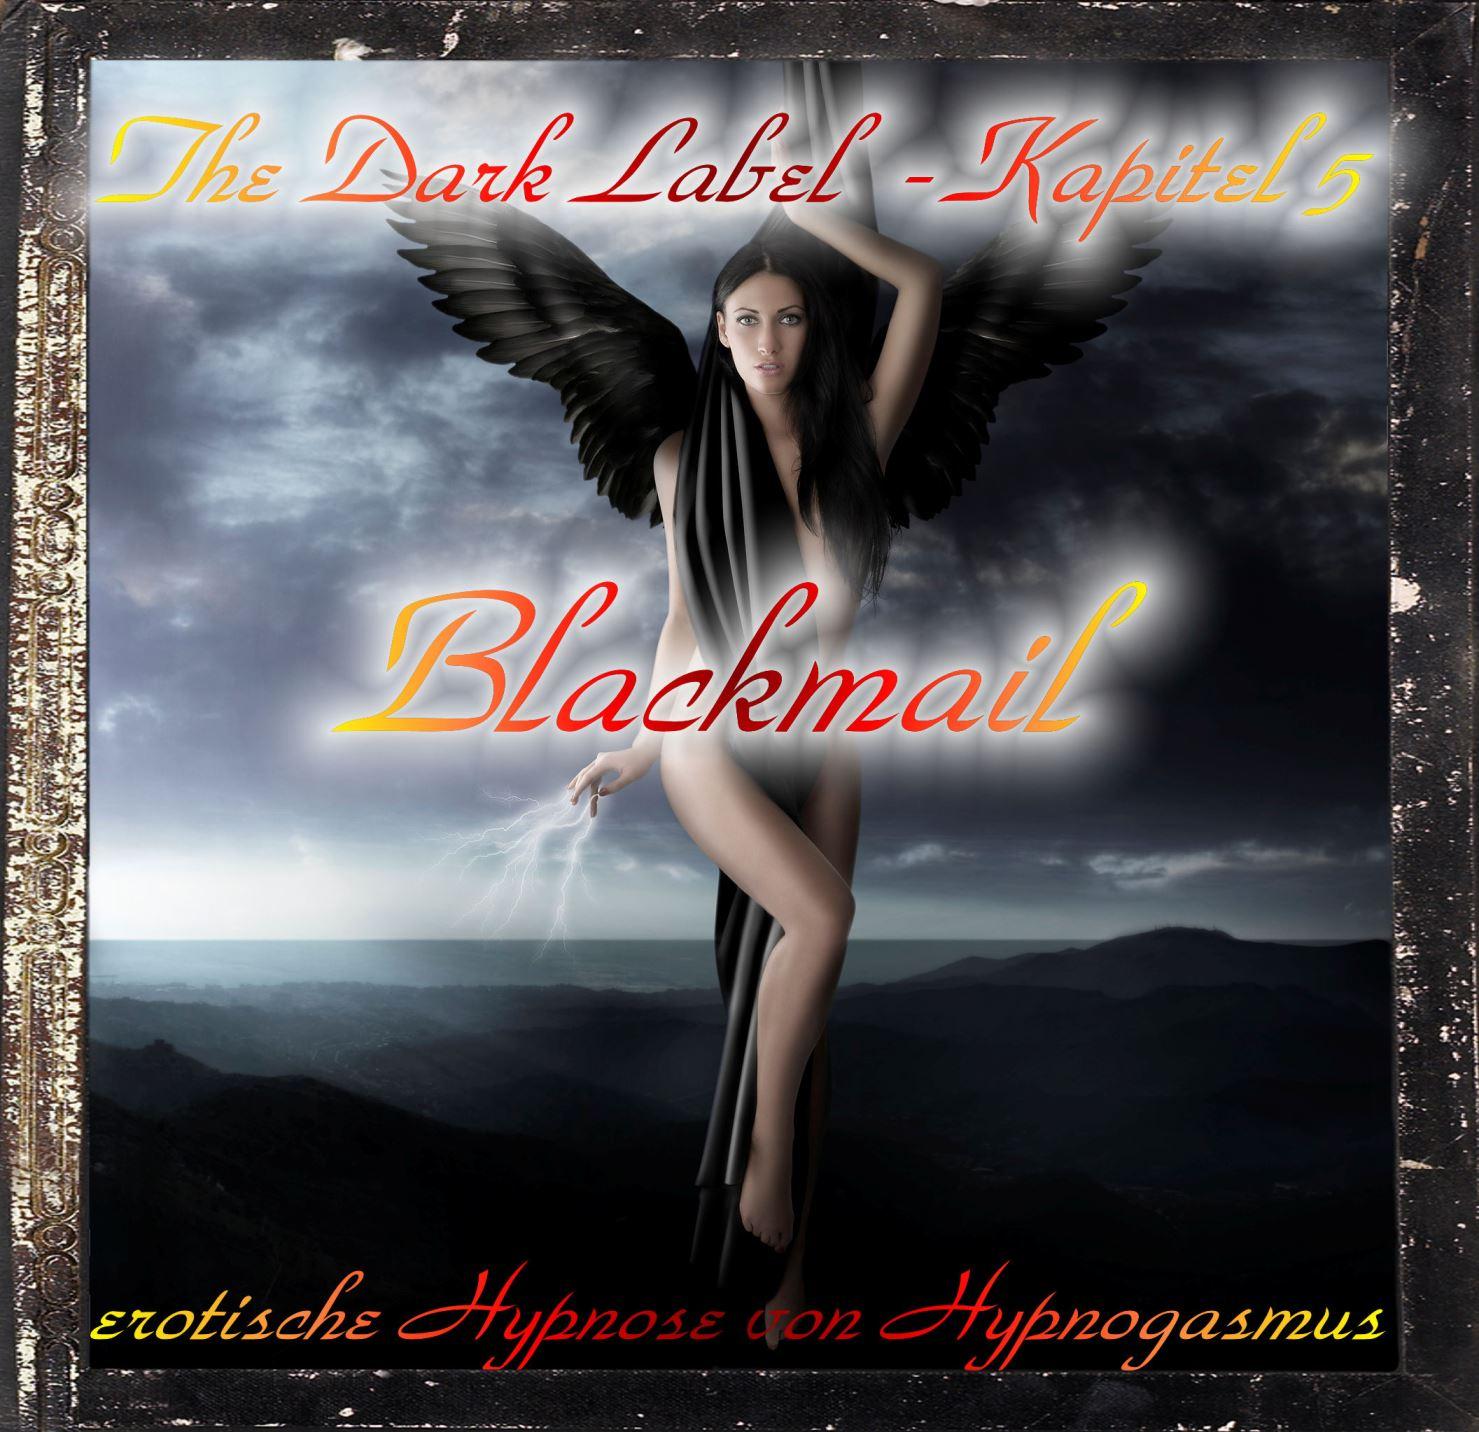 Dark Label - Kapitel 5